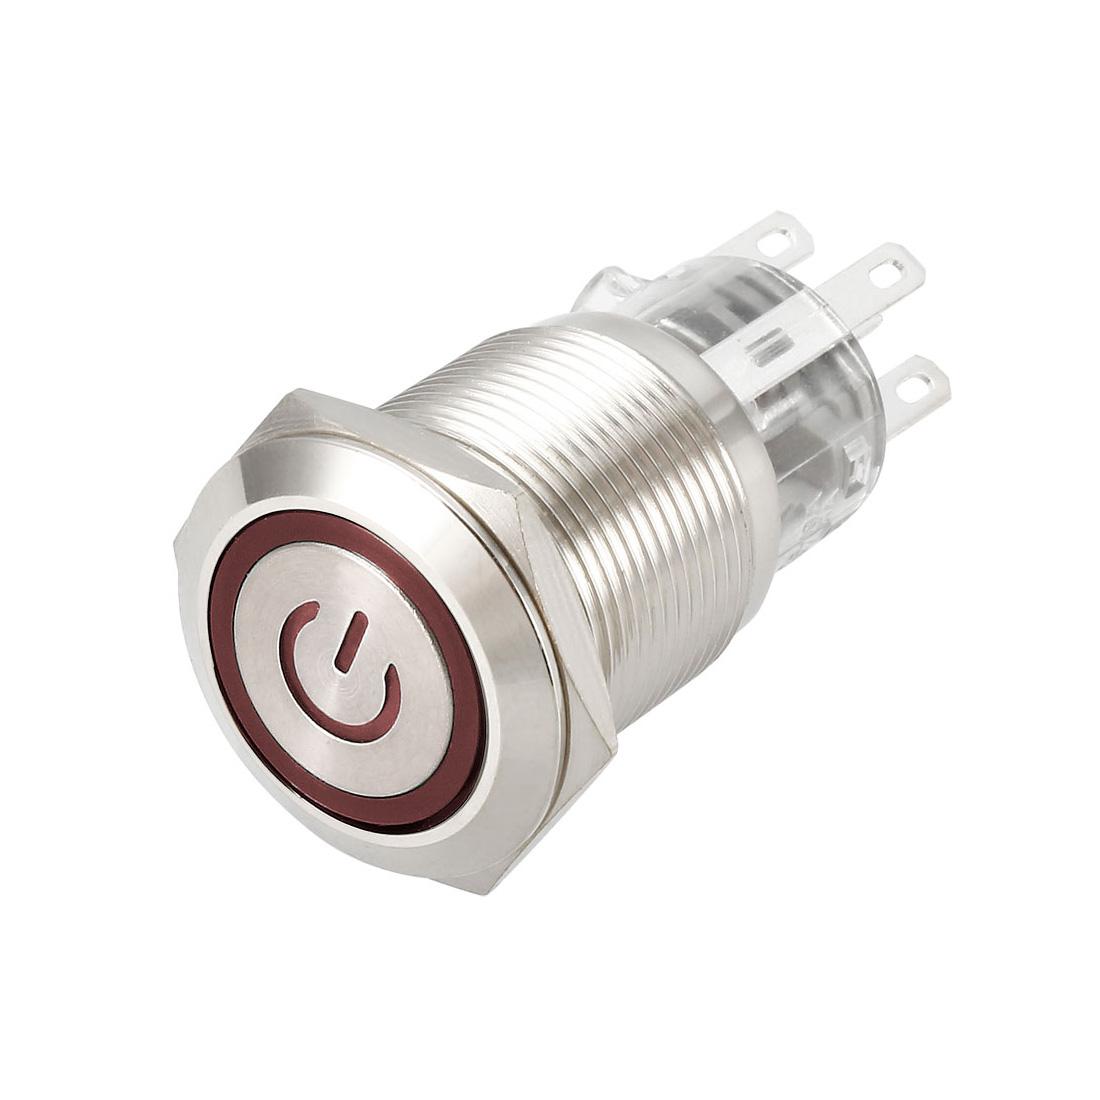 Latching Metal Push Button Switch 19mm Mounting 1NO 1NC 12V Red LED Light 1pcs